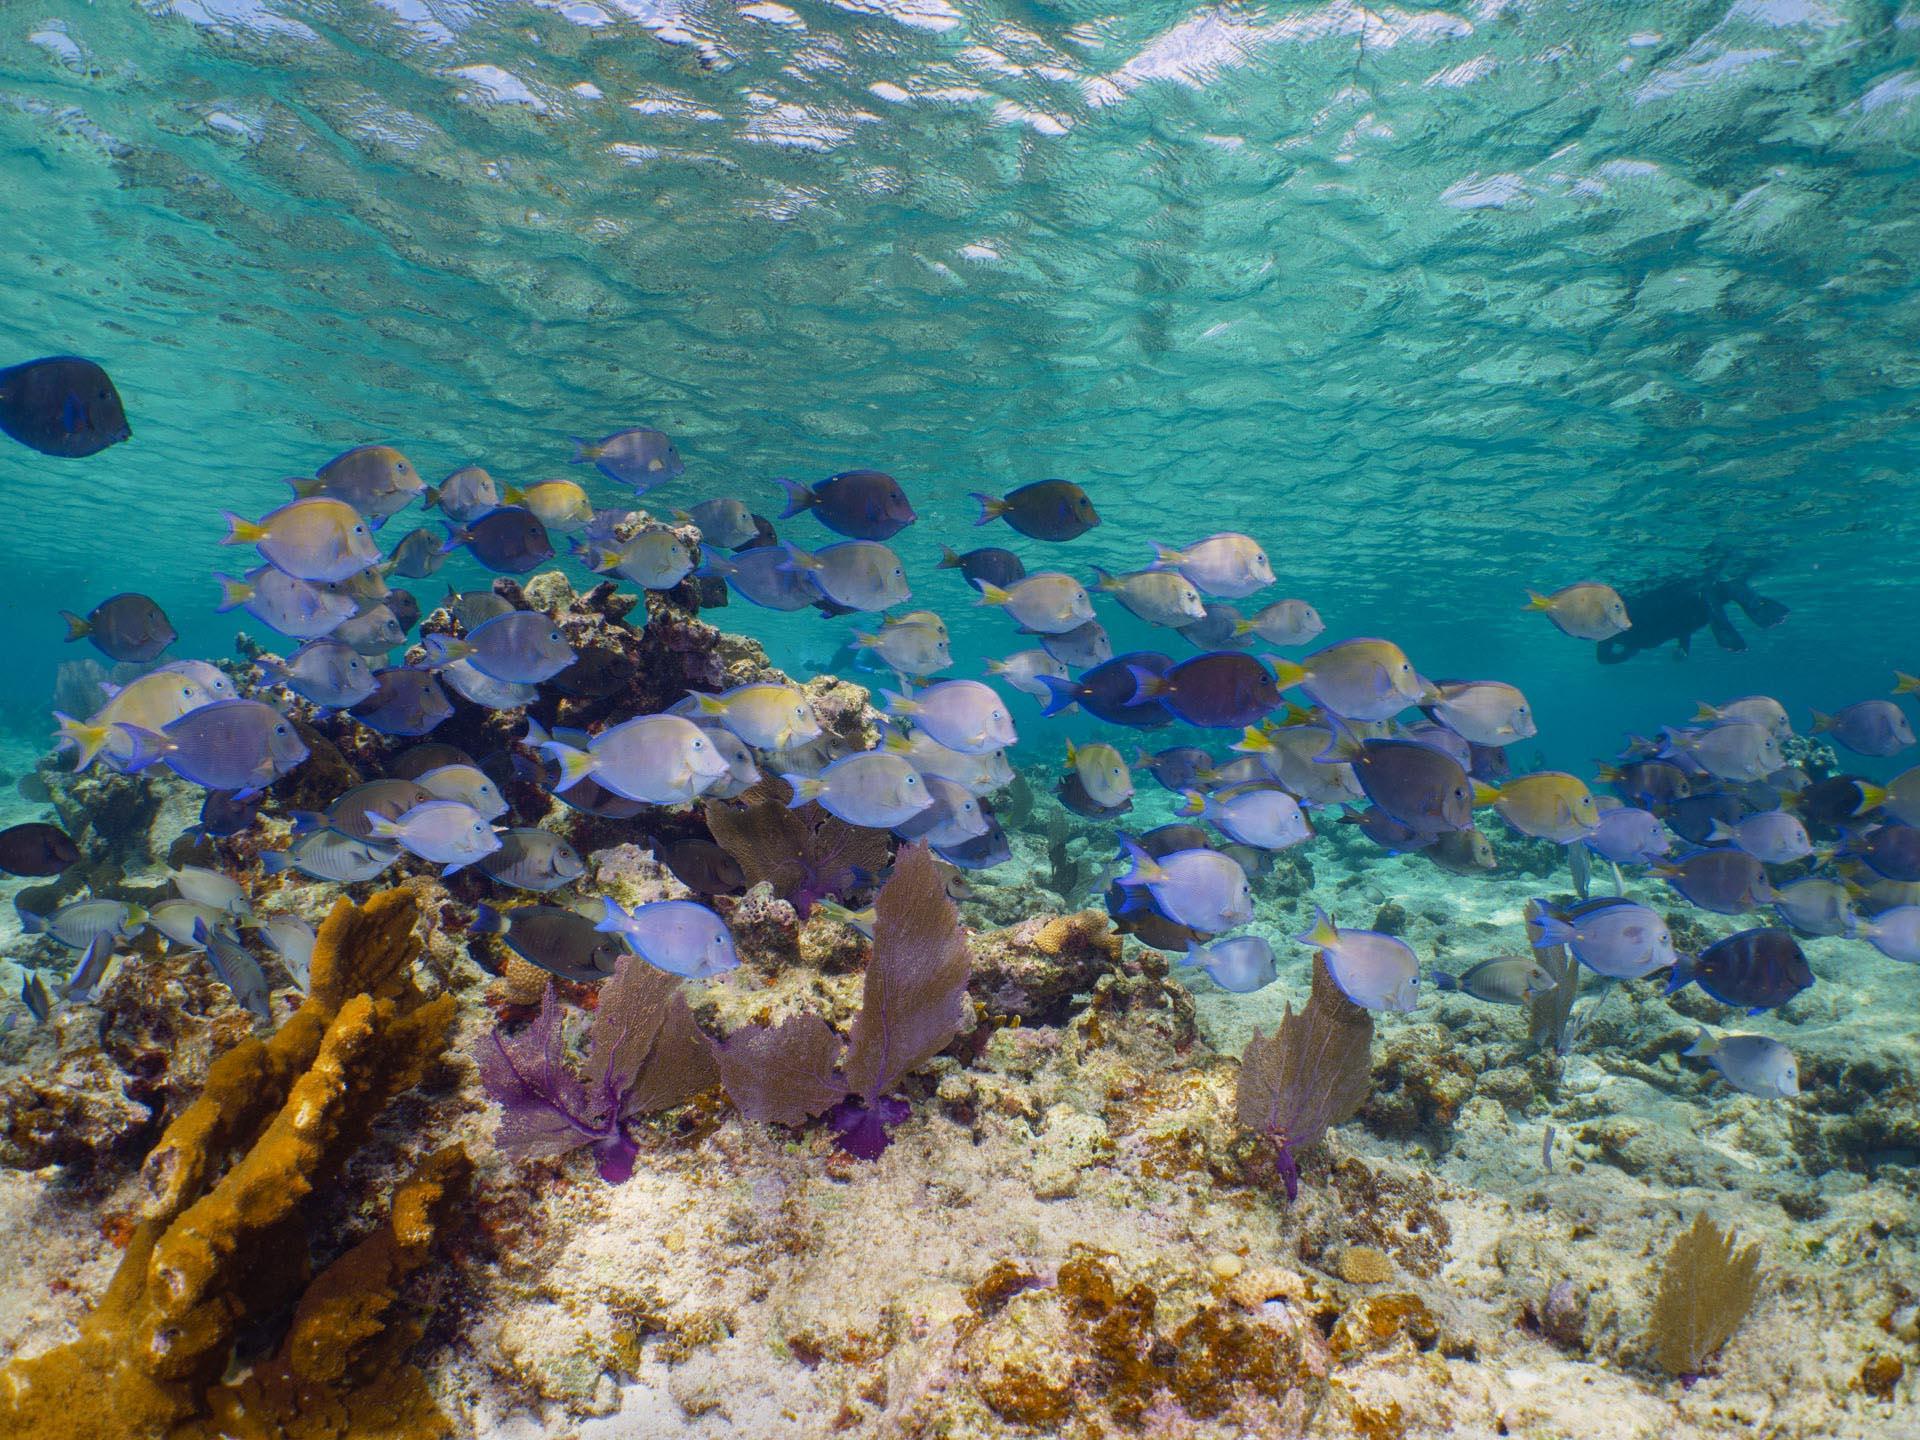 Surgeon fish schooling over reef